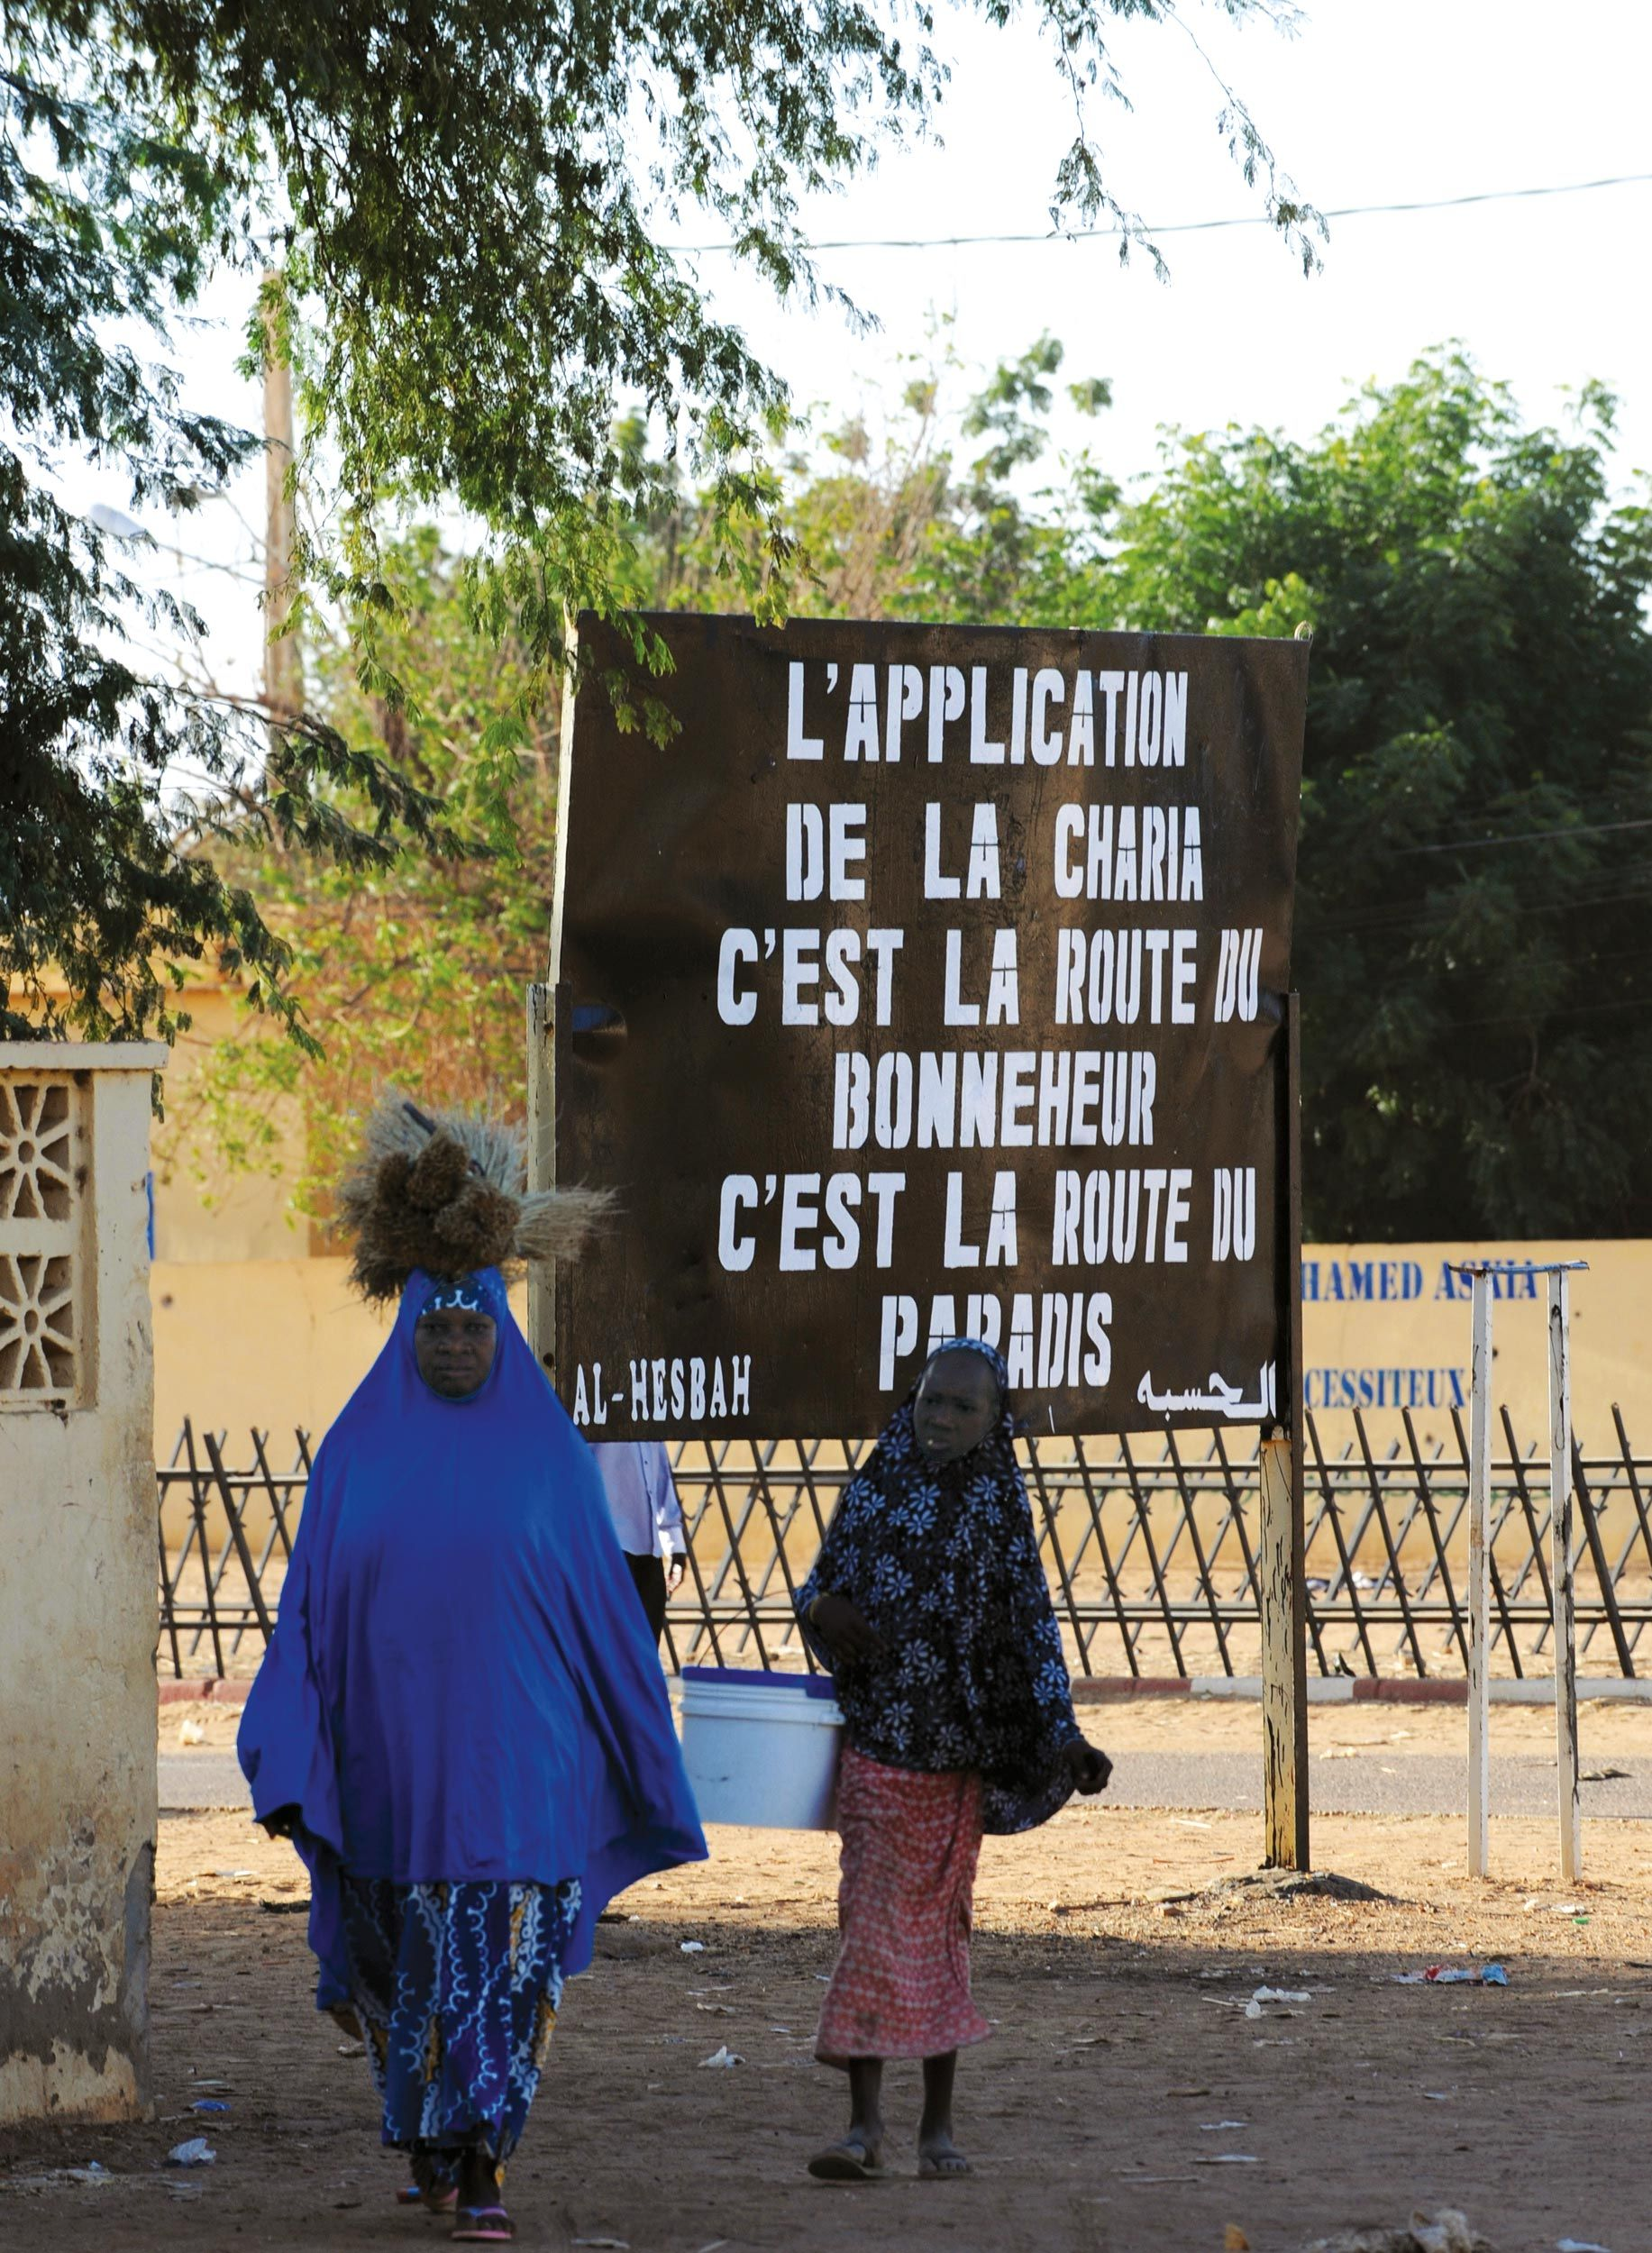 <stamp theme='his-green2'>Doc. 4</stamp> Panneau d'un groupe islamiste, à Gao au Mali